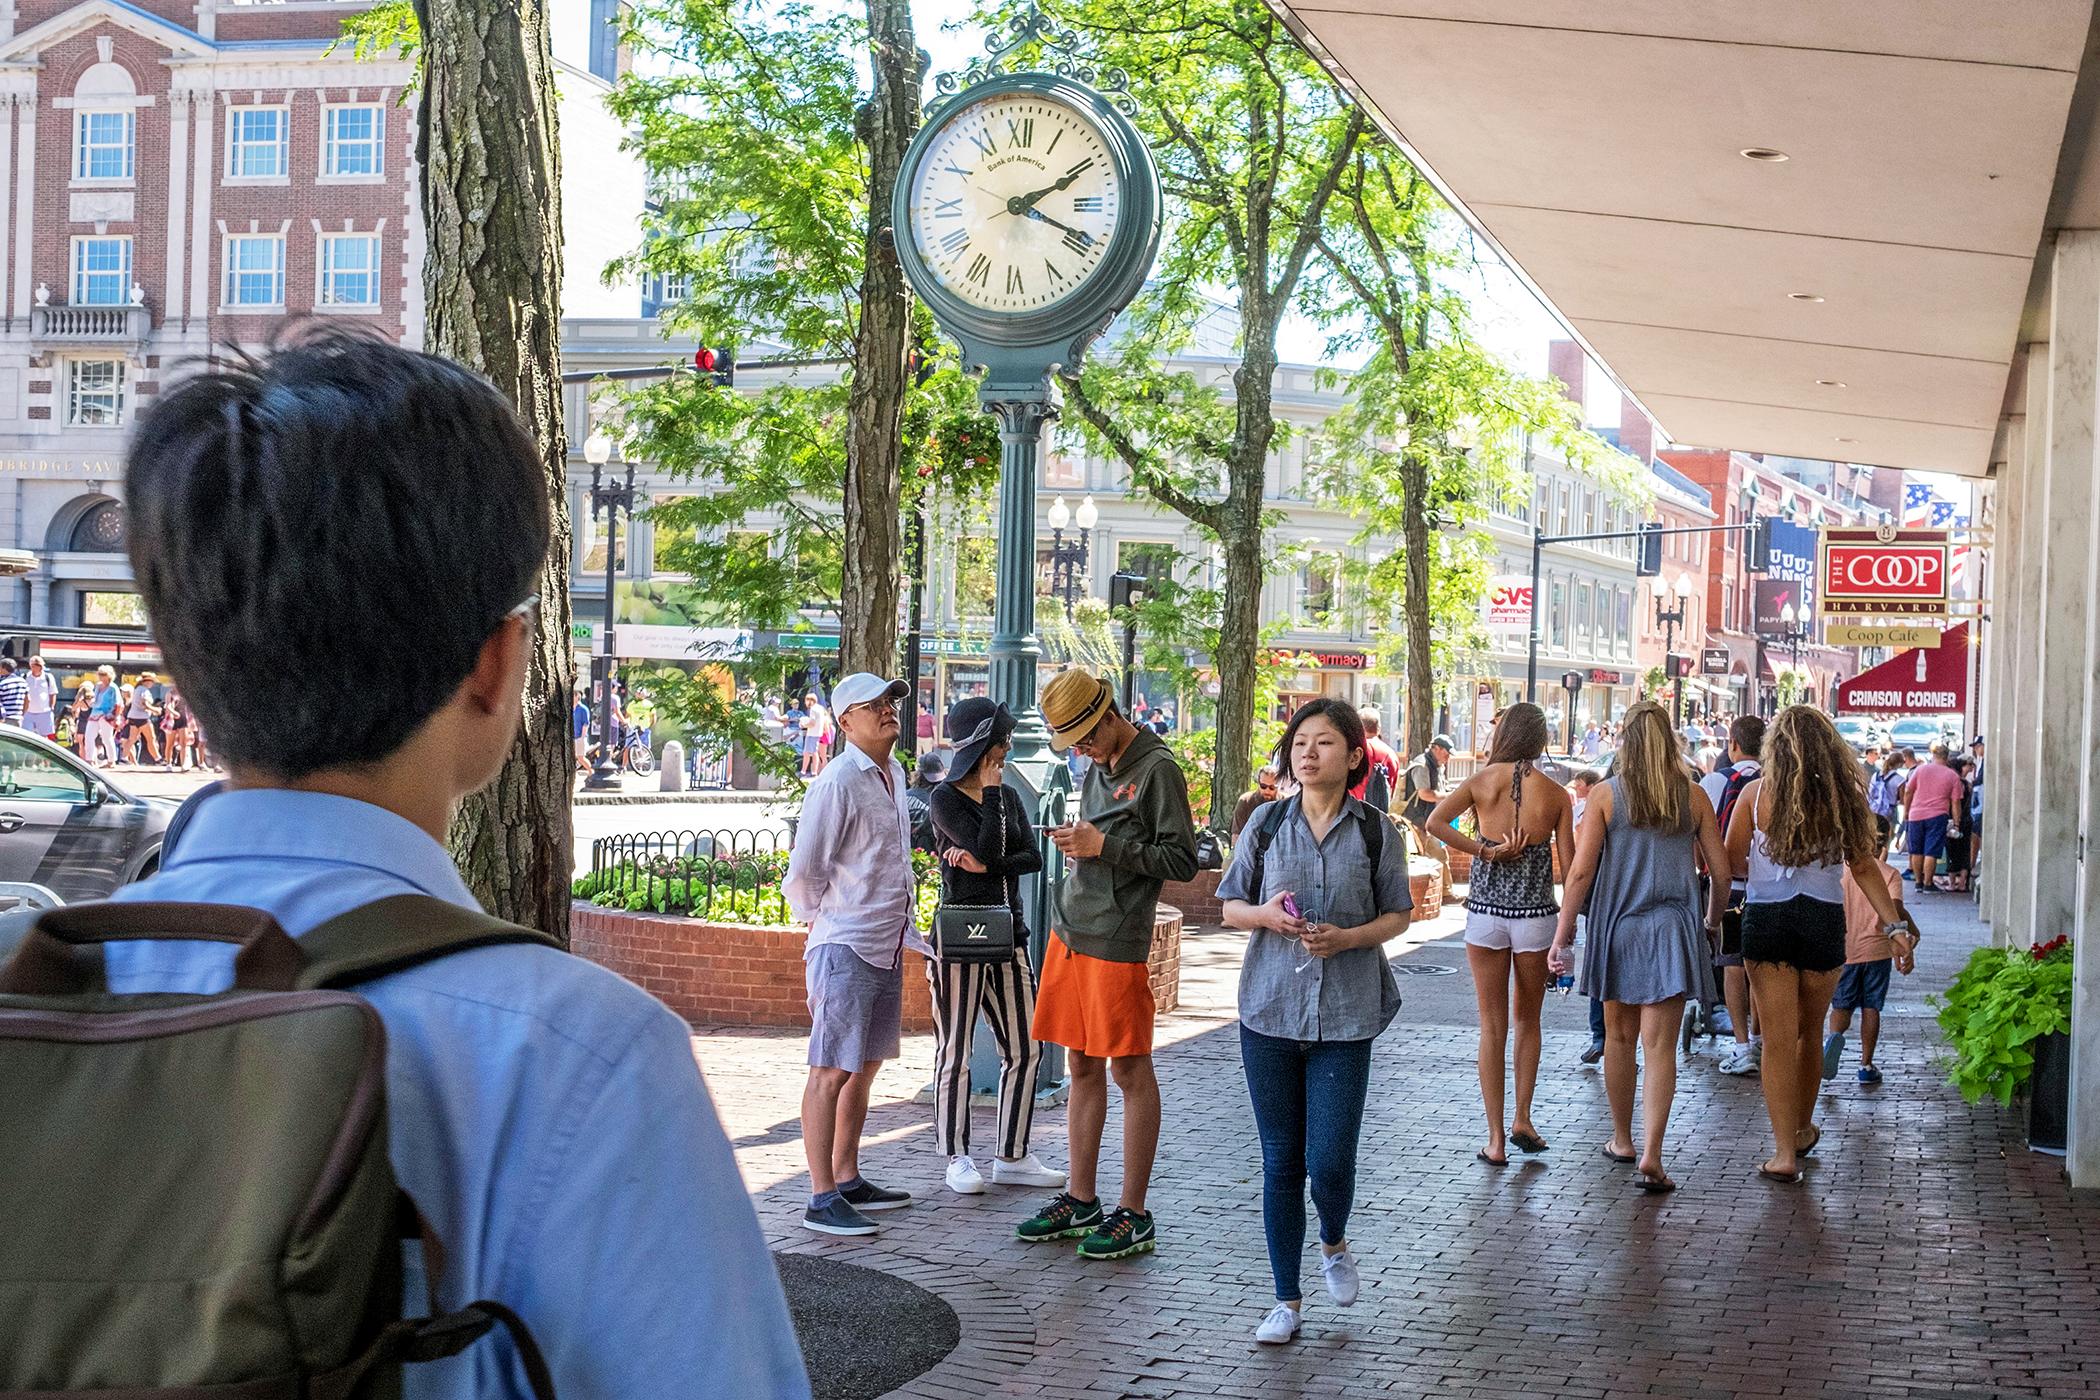 Students walk through Harvard Square, Cambridge, Massachusetts.